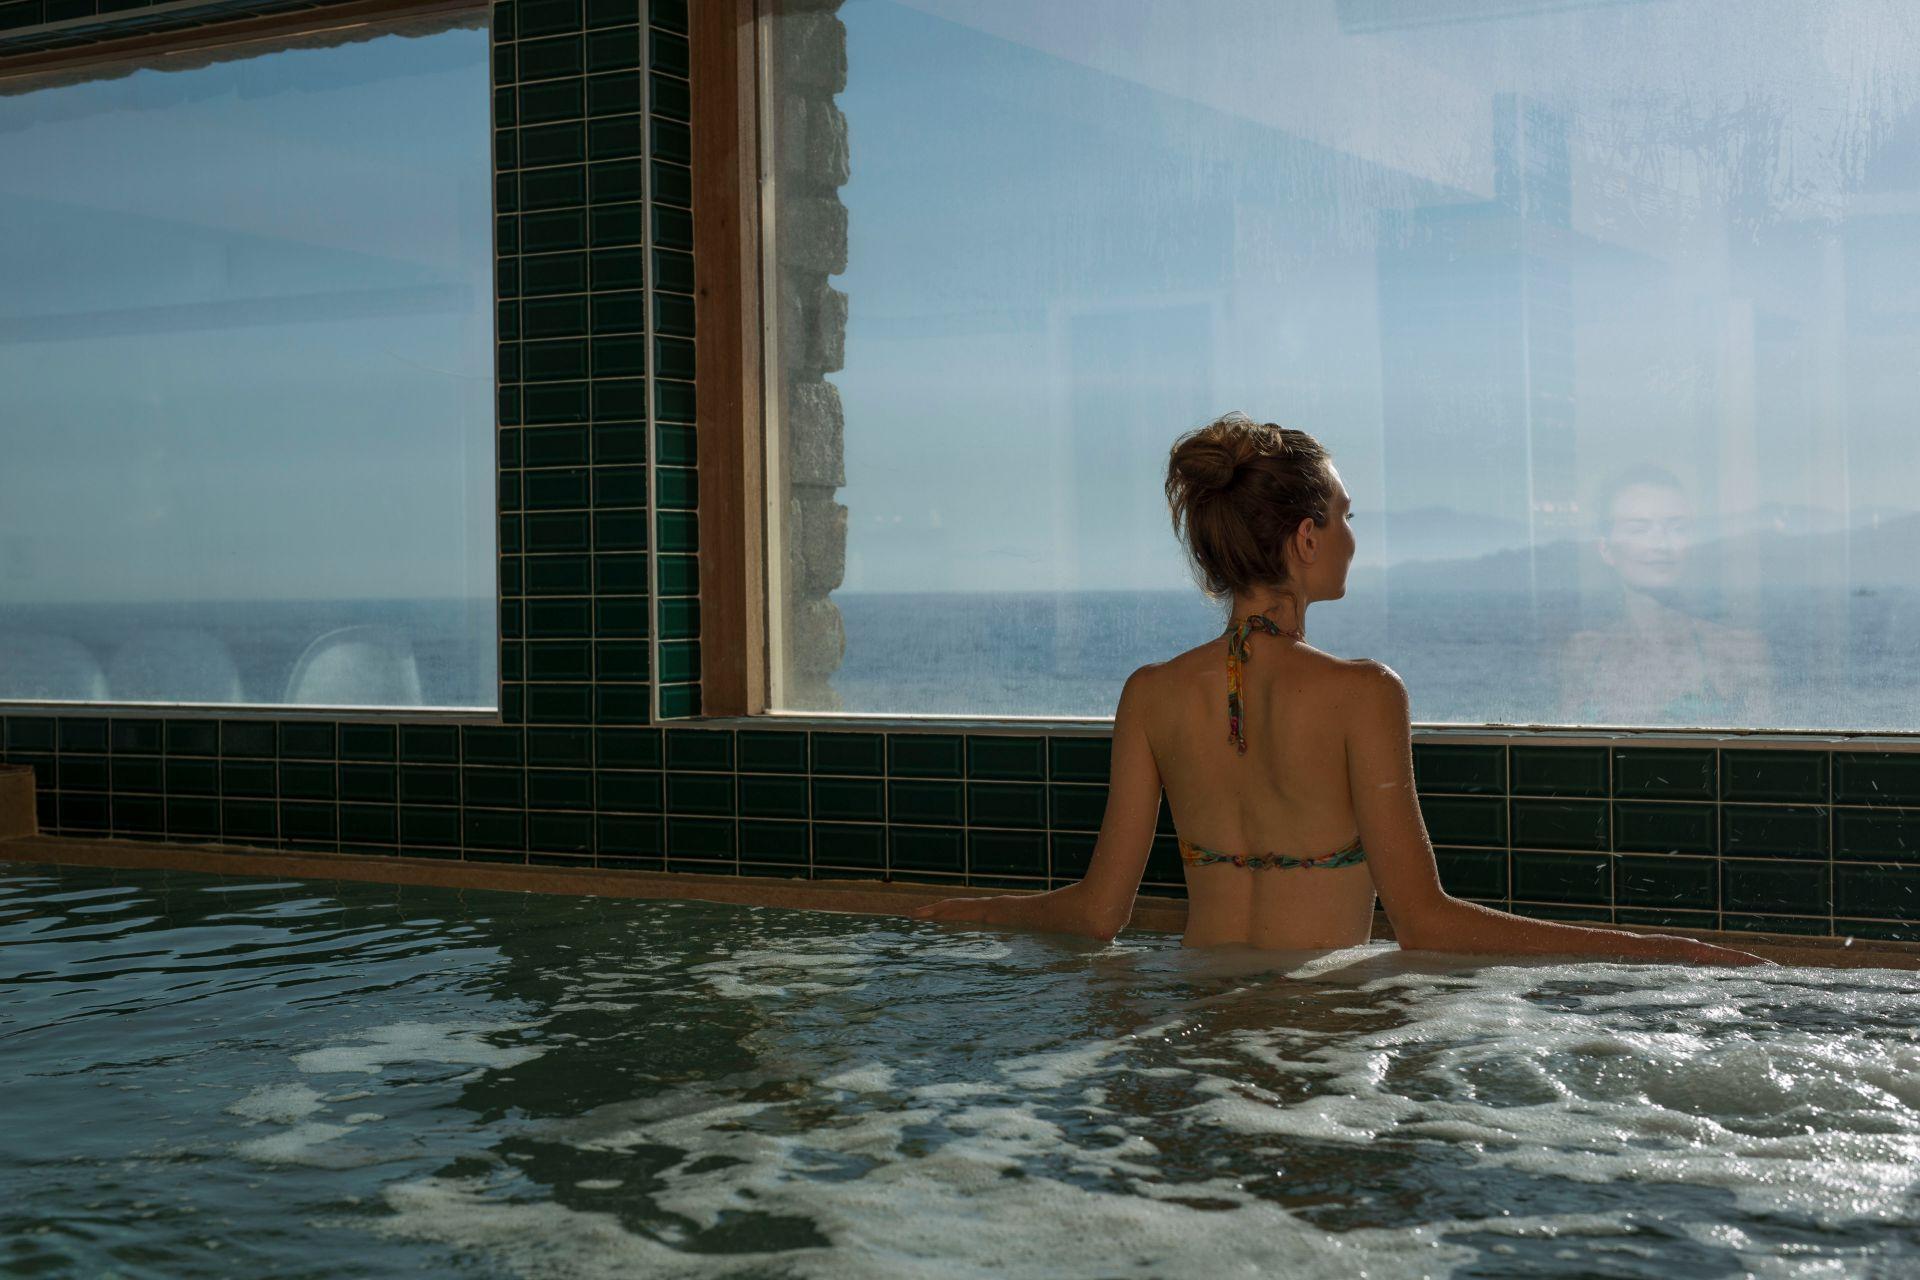 hotel-la-pietra corse-ile-rousse-piscine-seminaires-de-caractere